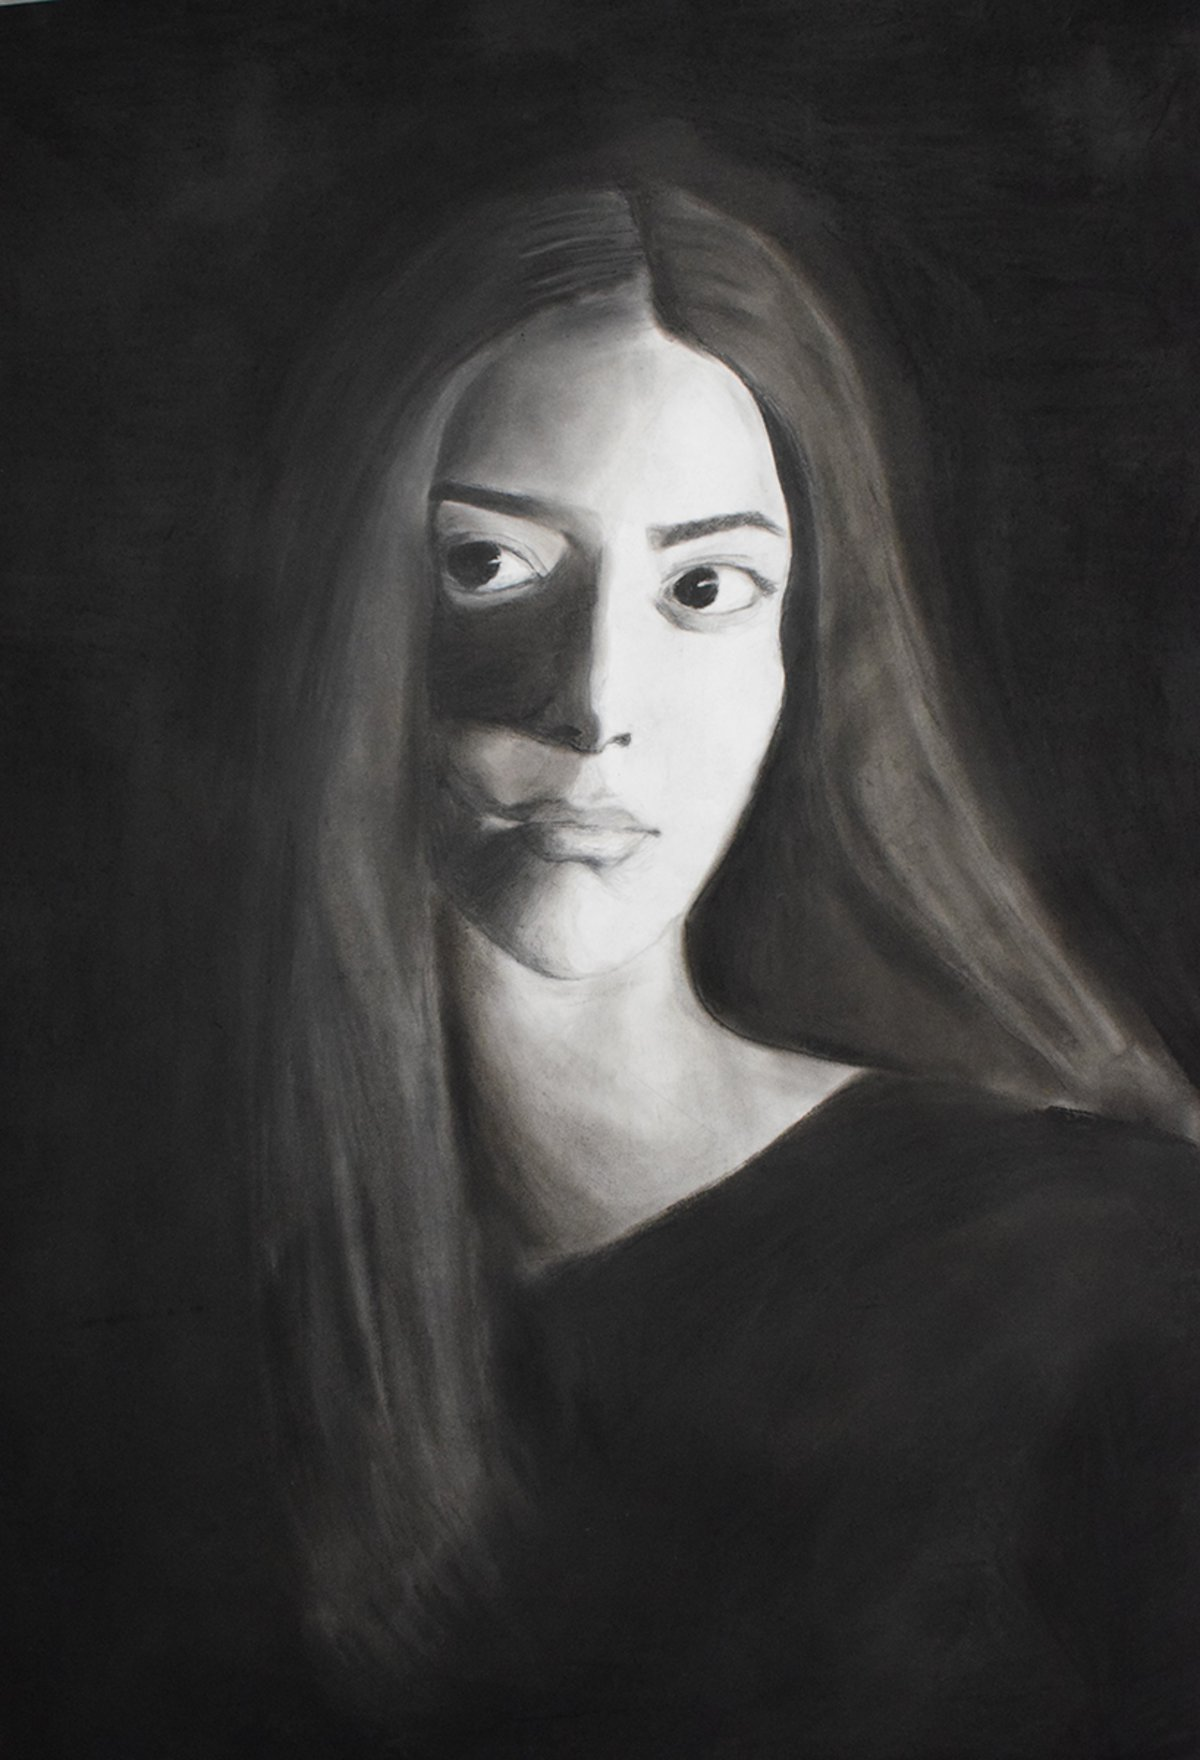 Janine Ginena